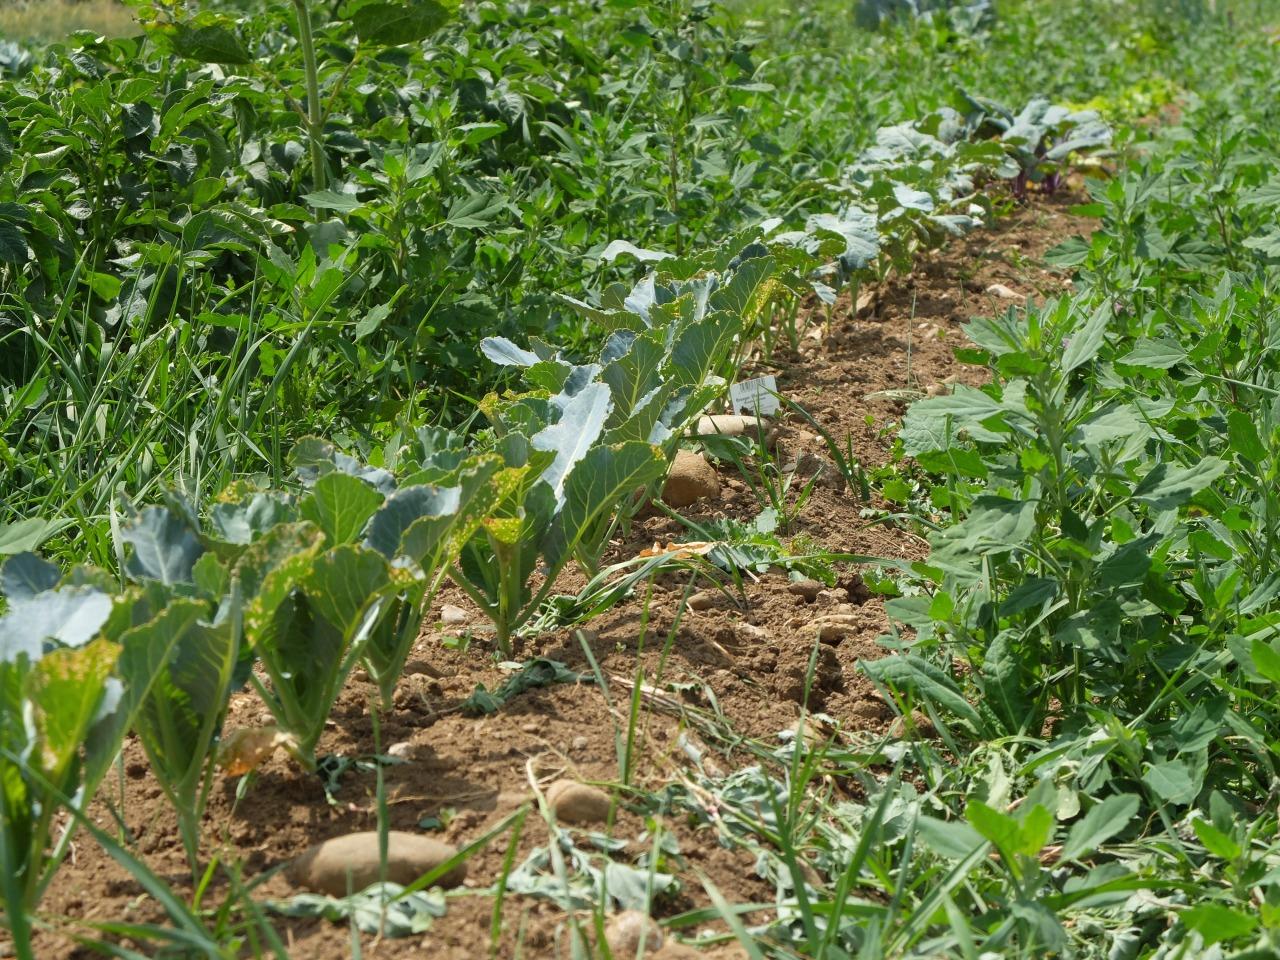 mangia minga - Unser Land Sonnenacker: rent a vegetable garden